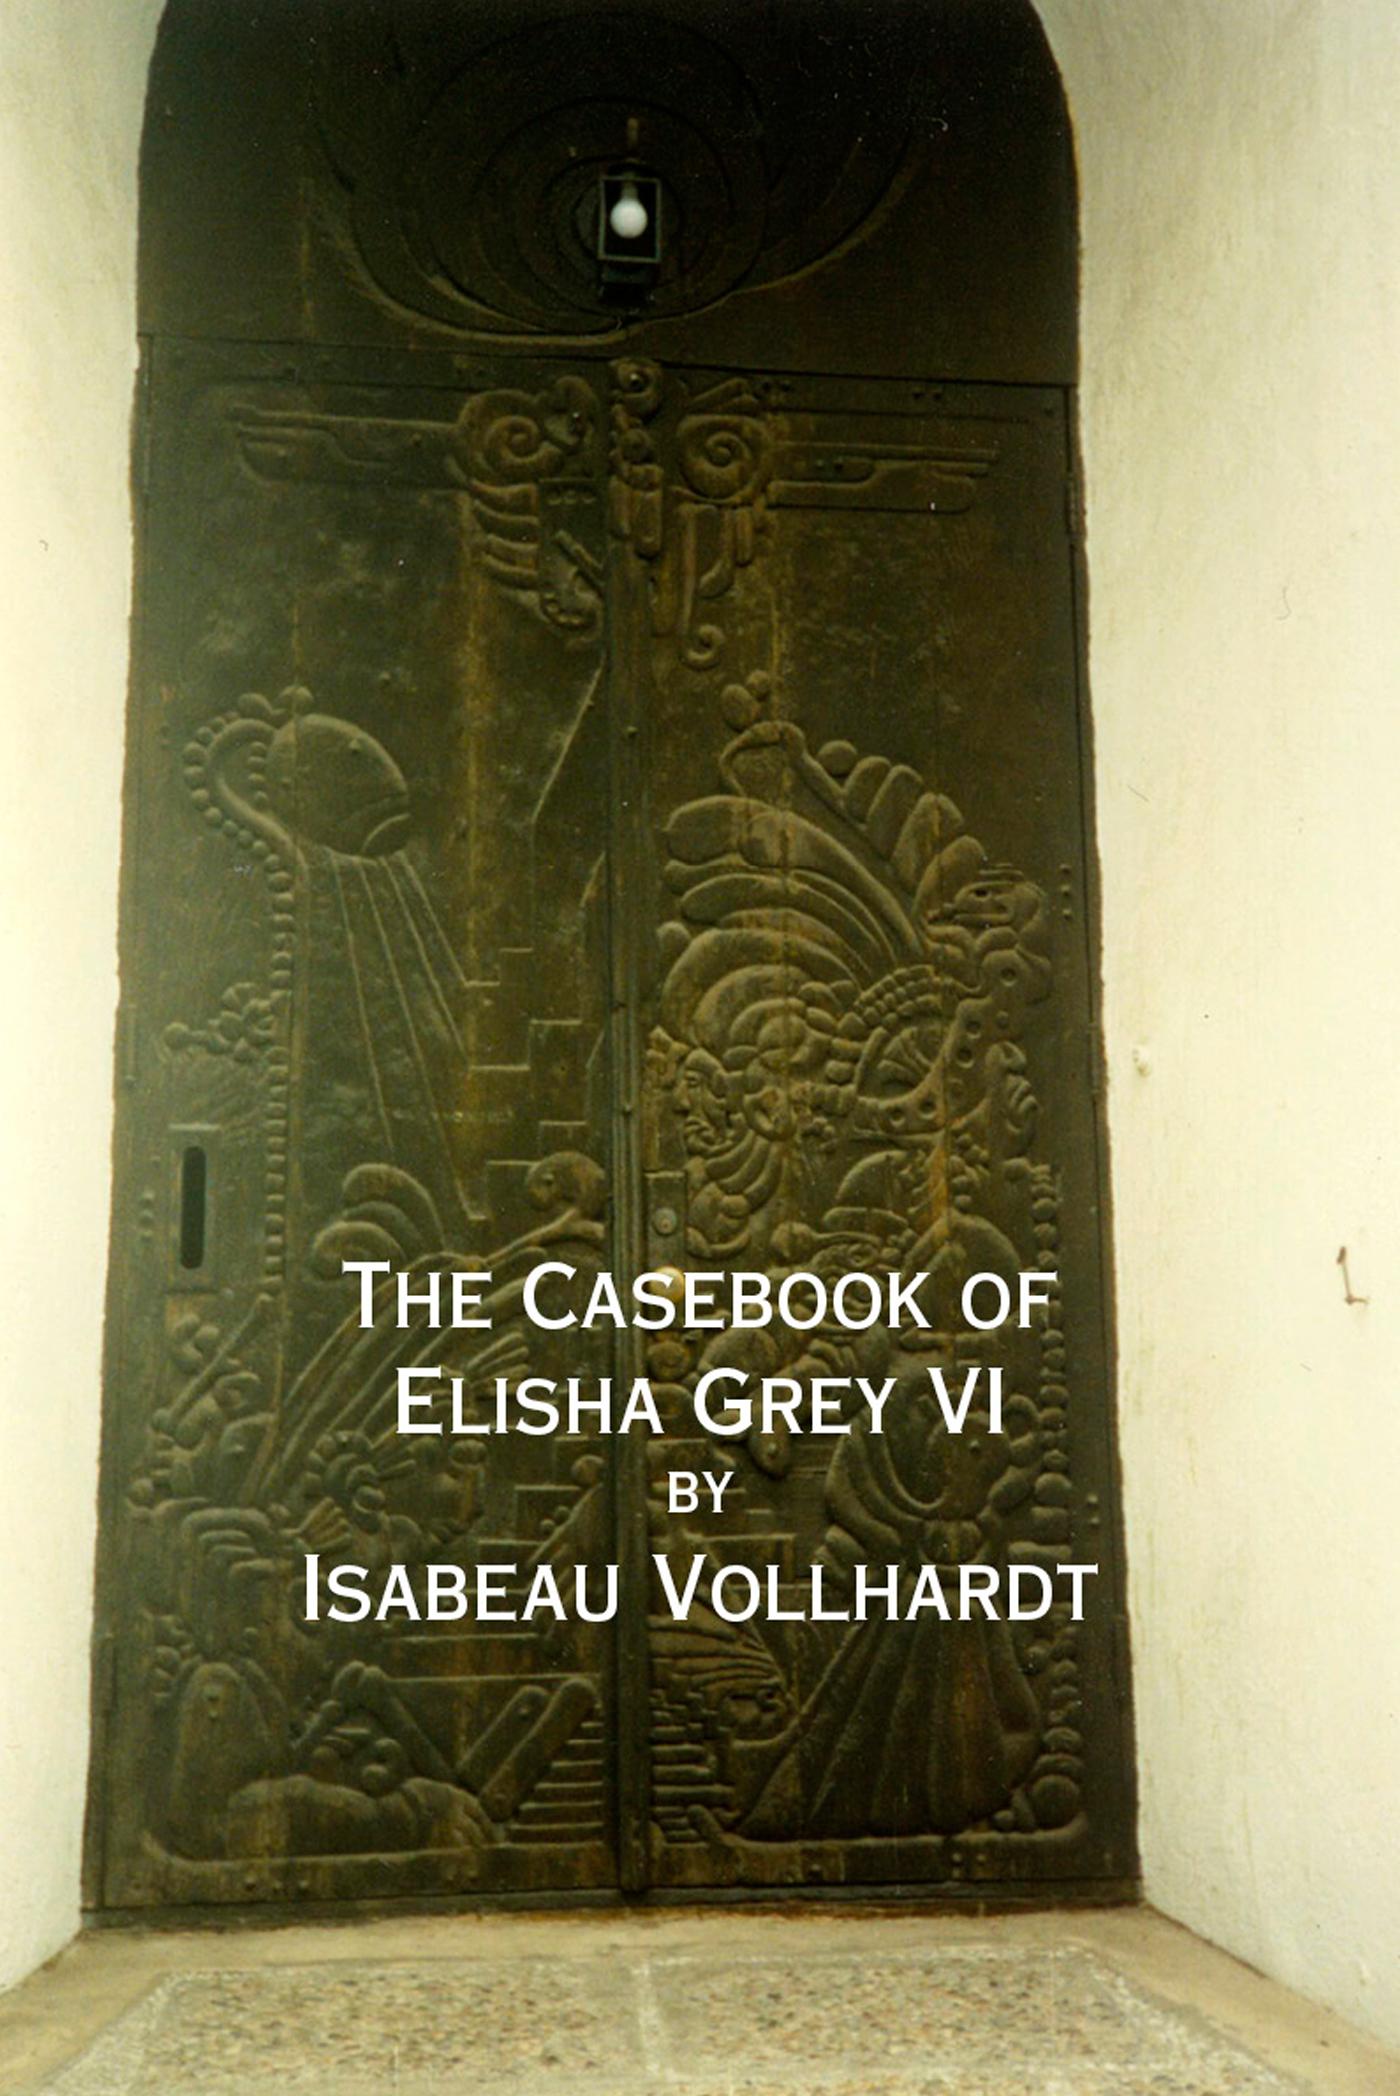 Isaveau Vollhardt Casebook VI (1400 x 2096 px).jpg